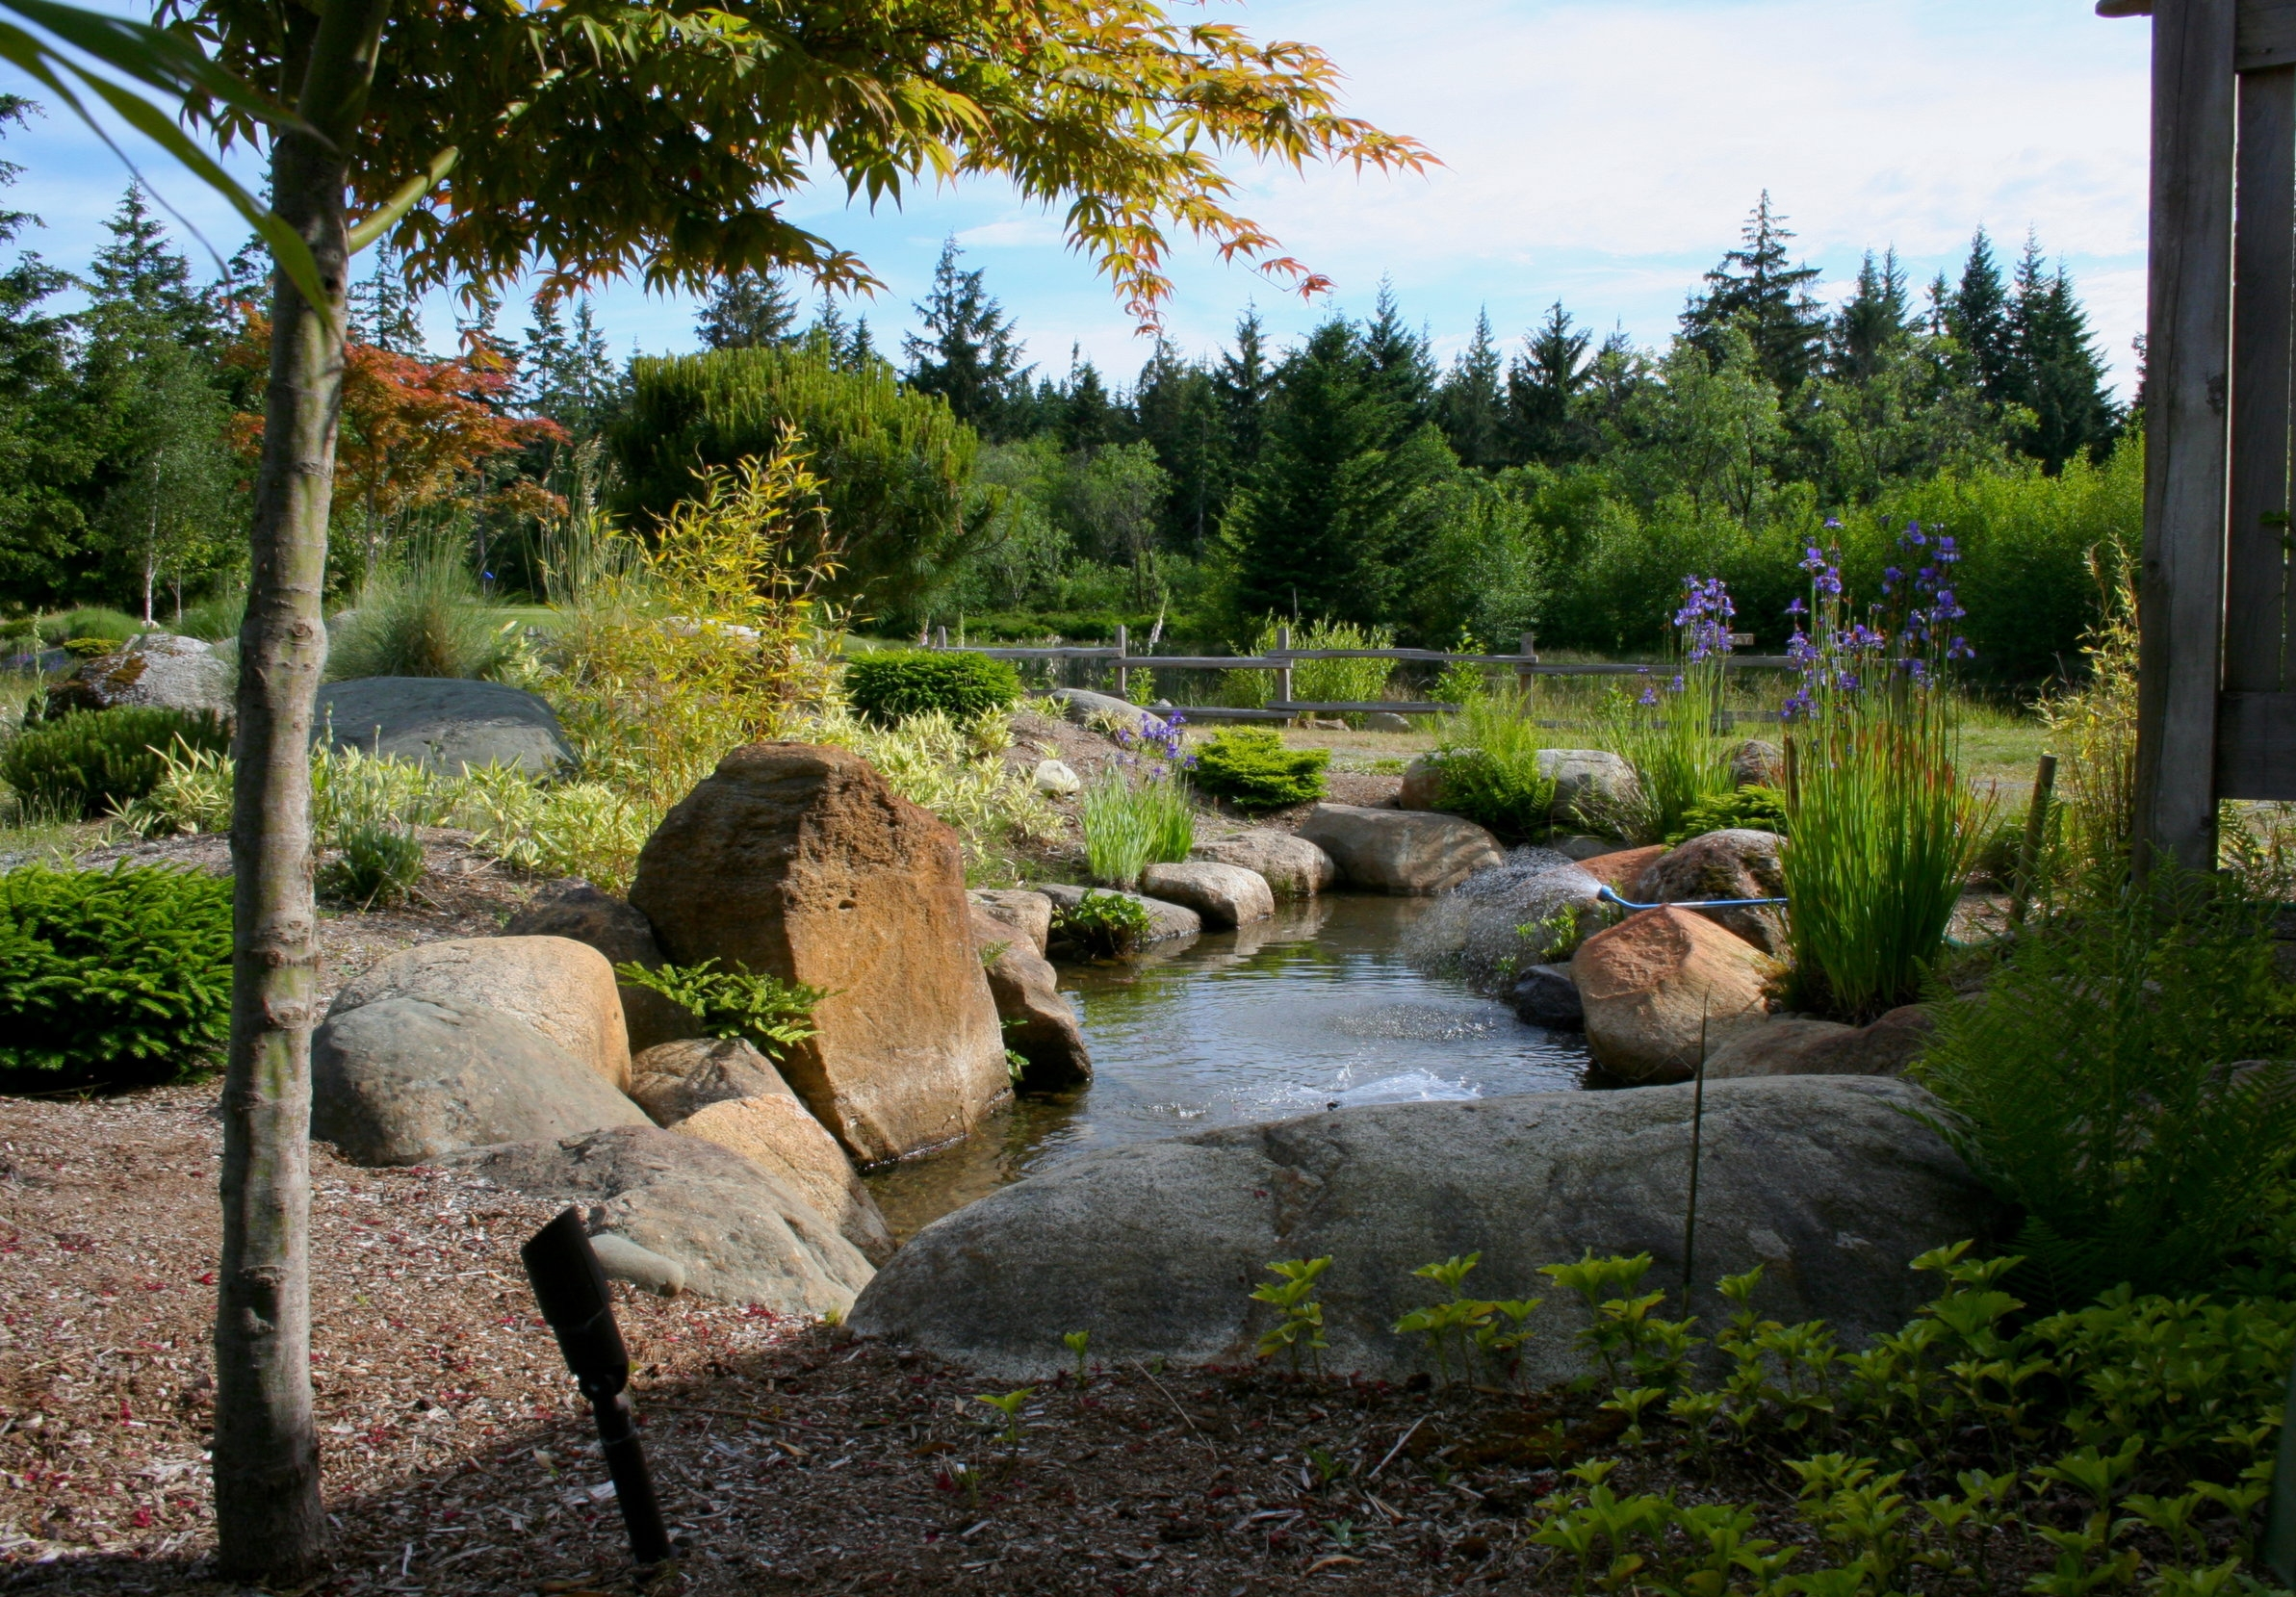 QuadraGolf_small pond_IMG_1547.jpeg